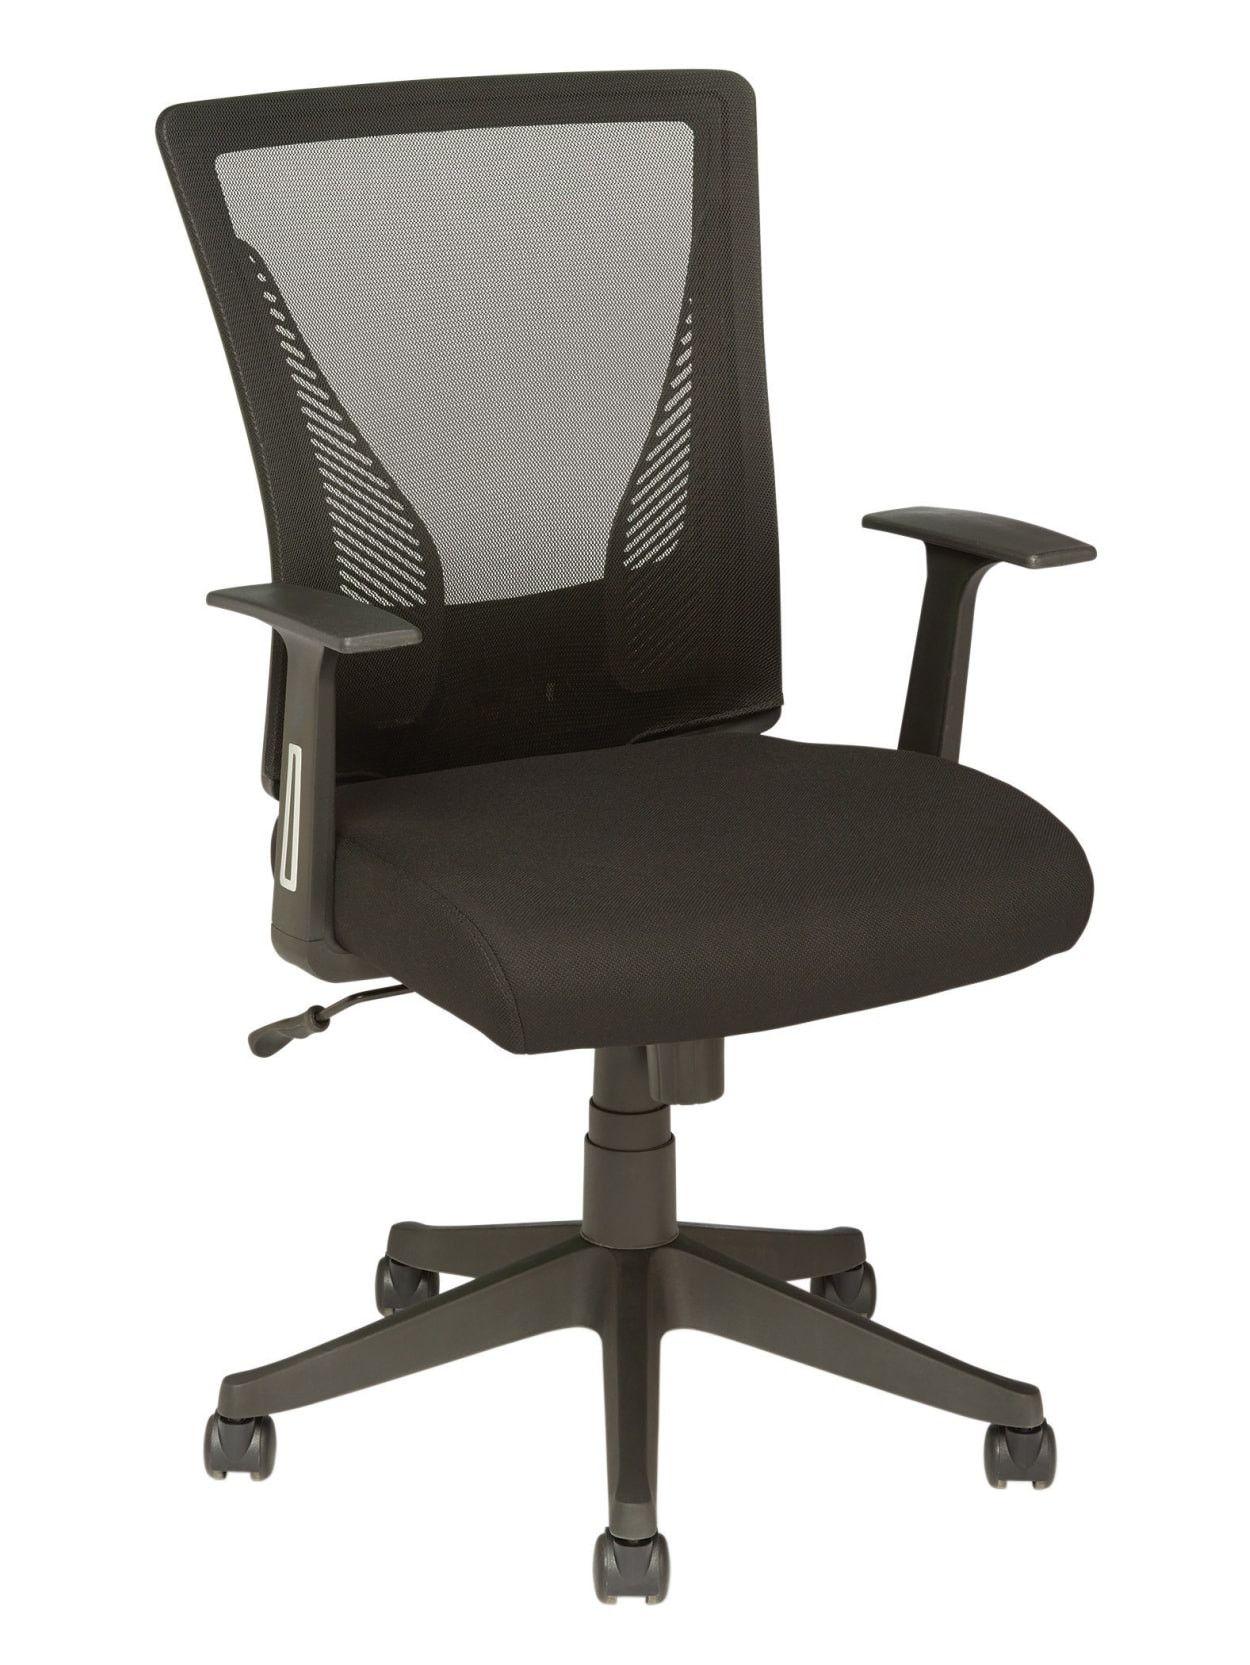 Office Chair Office Depot 2020 Task Chair Comfortable Office Chair Comfortable Desk